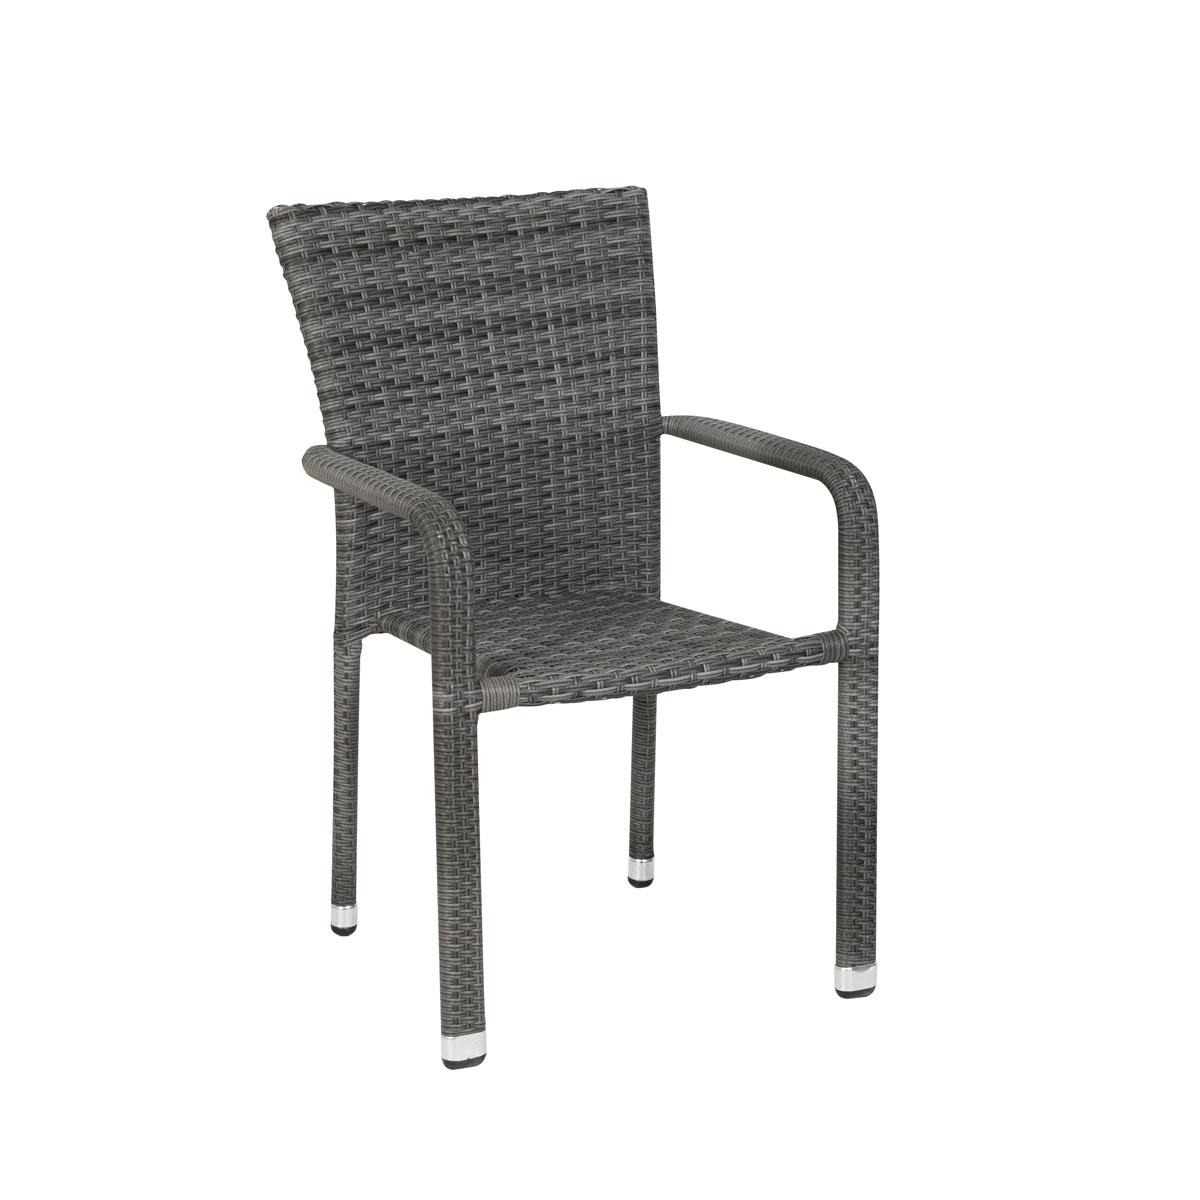 "Gartenstühle - Stuhlset ""Manila"", 6 Stück  - Onlineshop Hellweg"